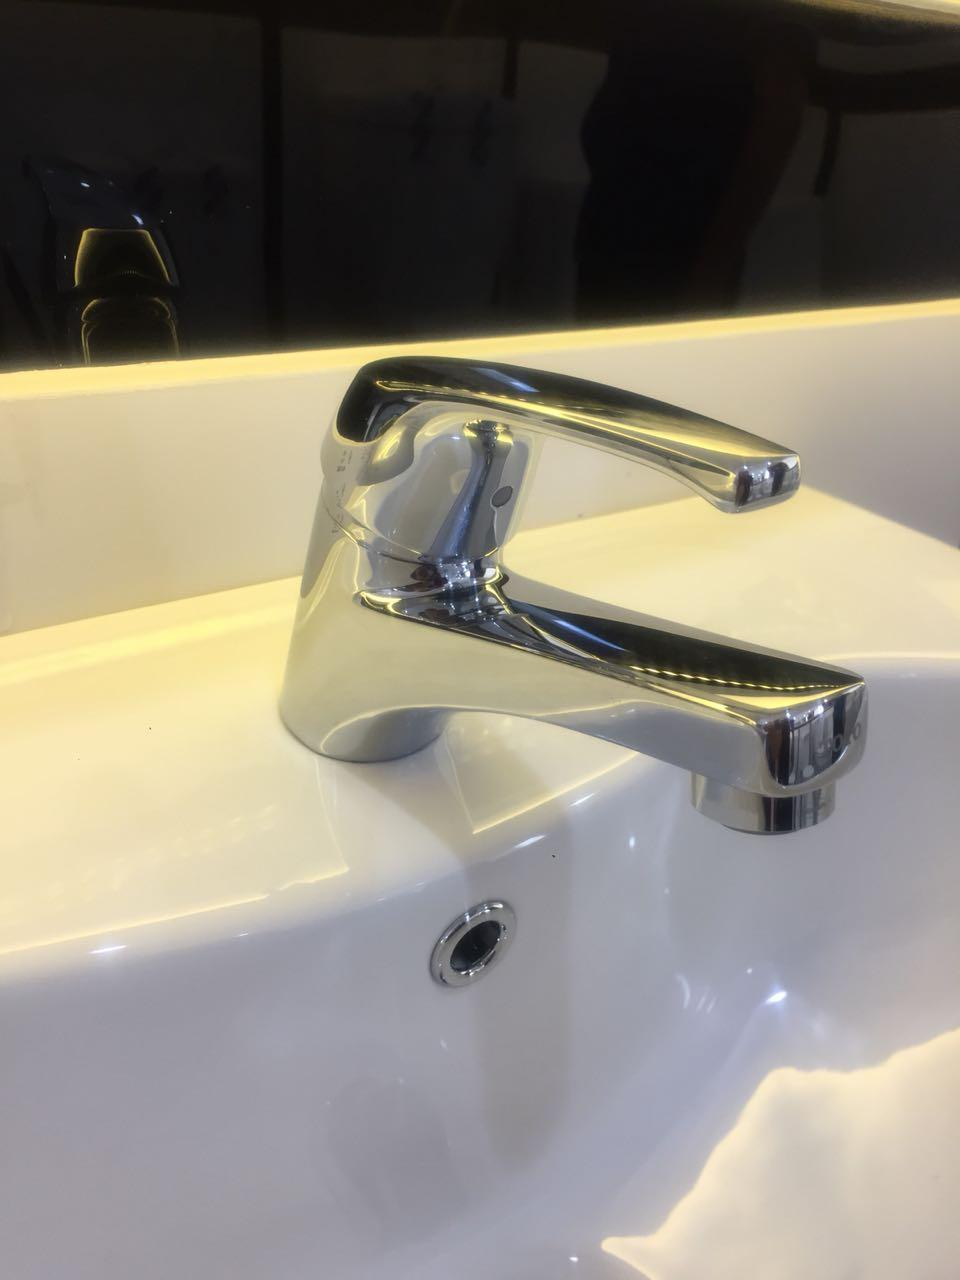 Toto Tx109ld Update Daftar Harga Terbaru Indonesia Tx116len Extended Single Lever Lavatory Faucet Keran Wastafel Levr